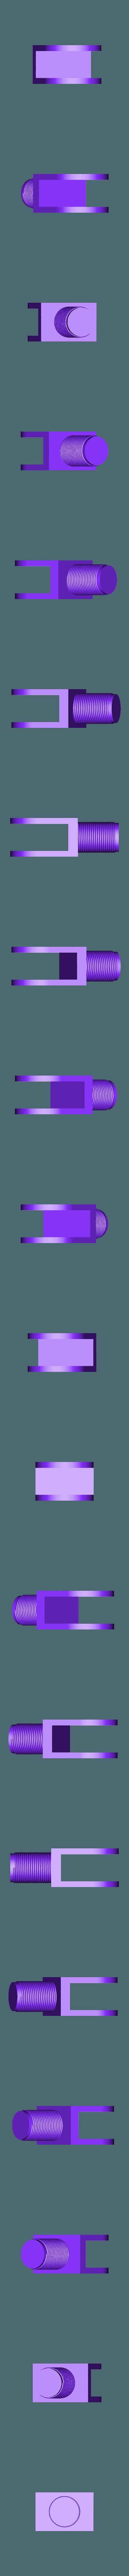 STL_S5_v20_Scope_Mount_1_.stl Download free STL file Star Wars Naboo S5 Heavy Blaster Pistol • 3D printing design, Dsk